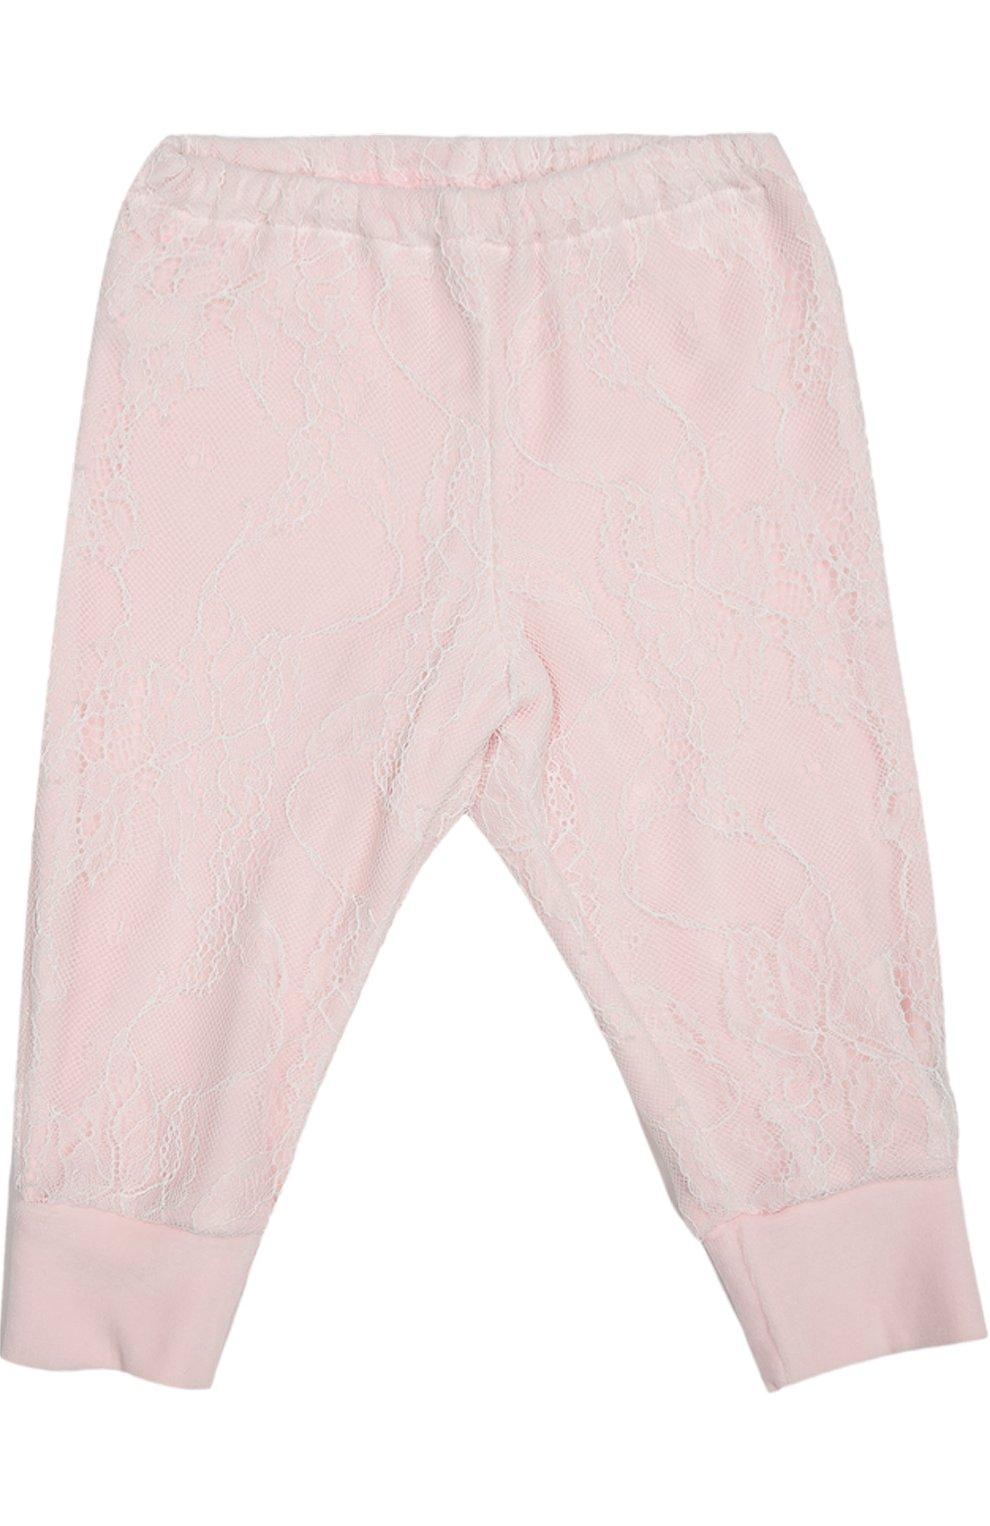 Детский костюм спортивный с футболкой  ALETTA розового цвета, арт. RP666112CIN/1M-18M | Фото 7